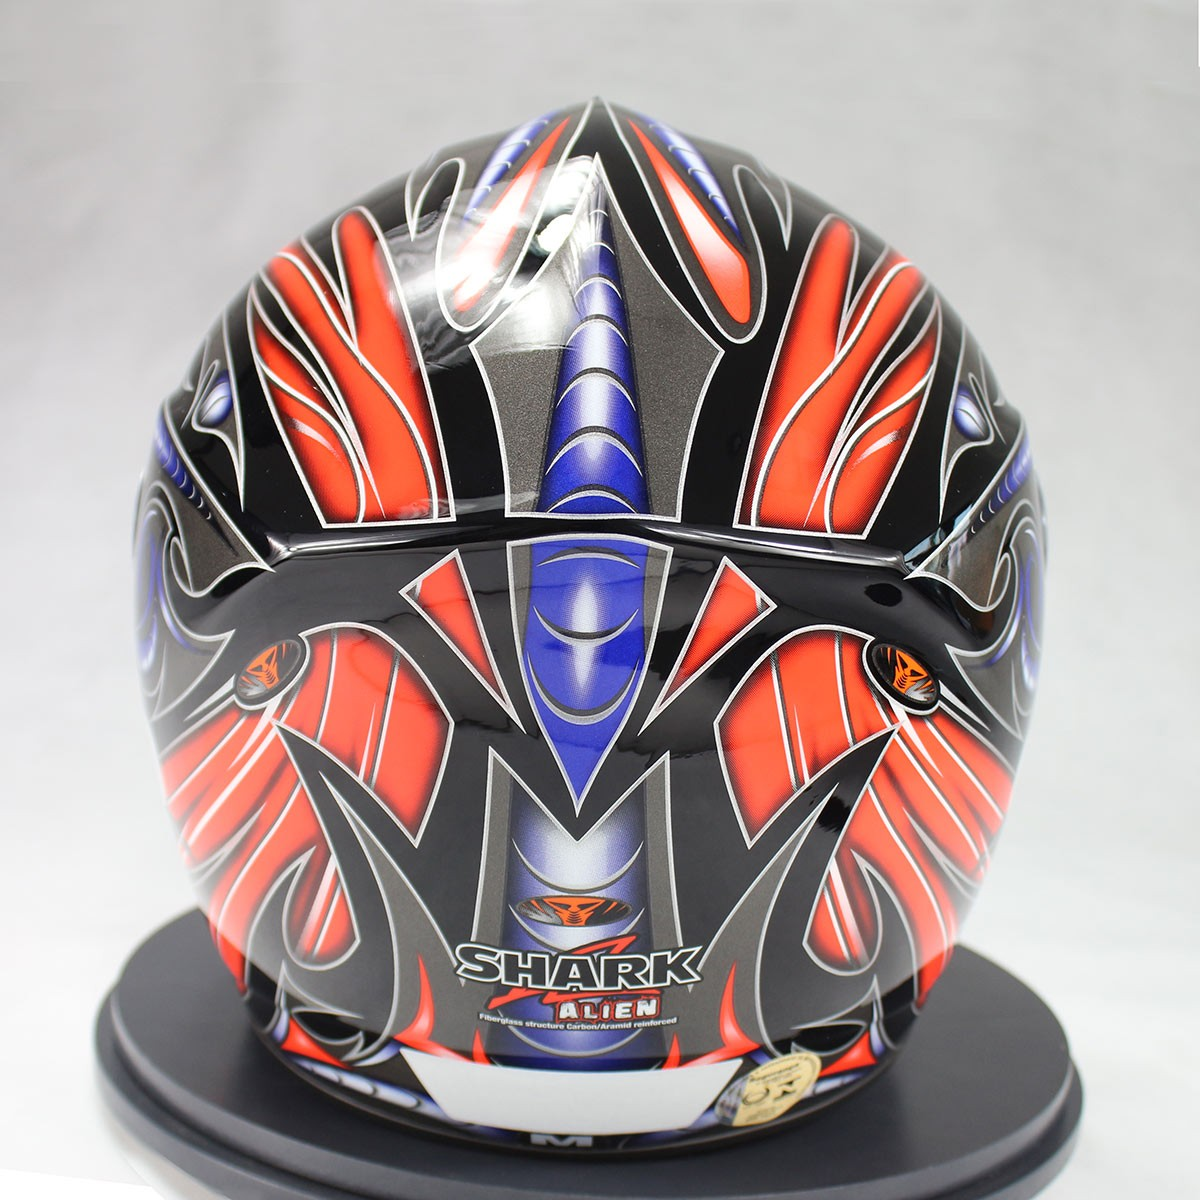 Capacete Shark RSI S2 Alien KRA  - Nova Suzuki Motos e Acessórios